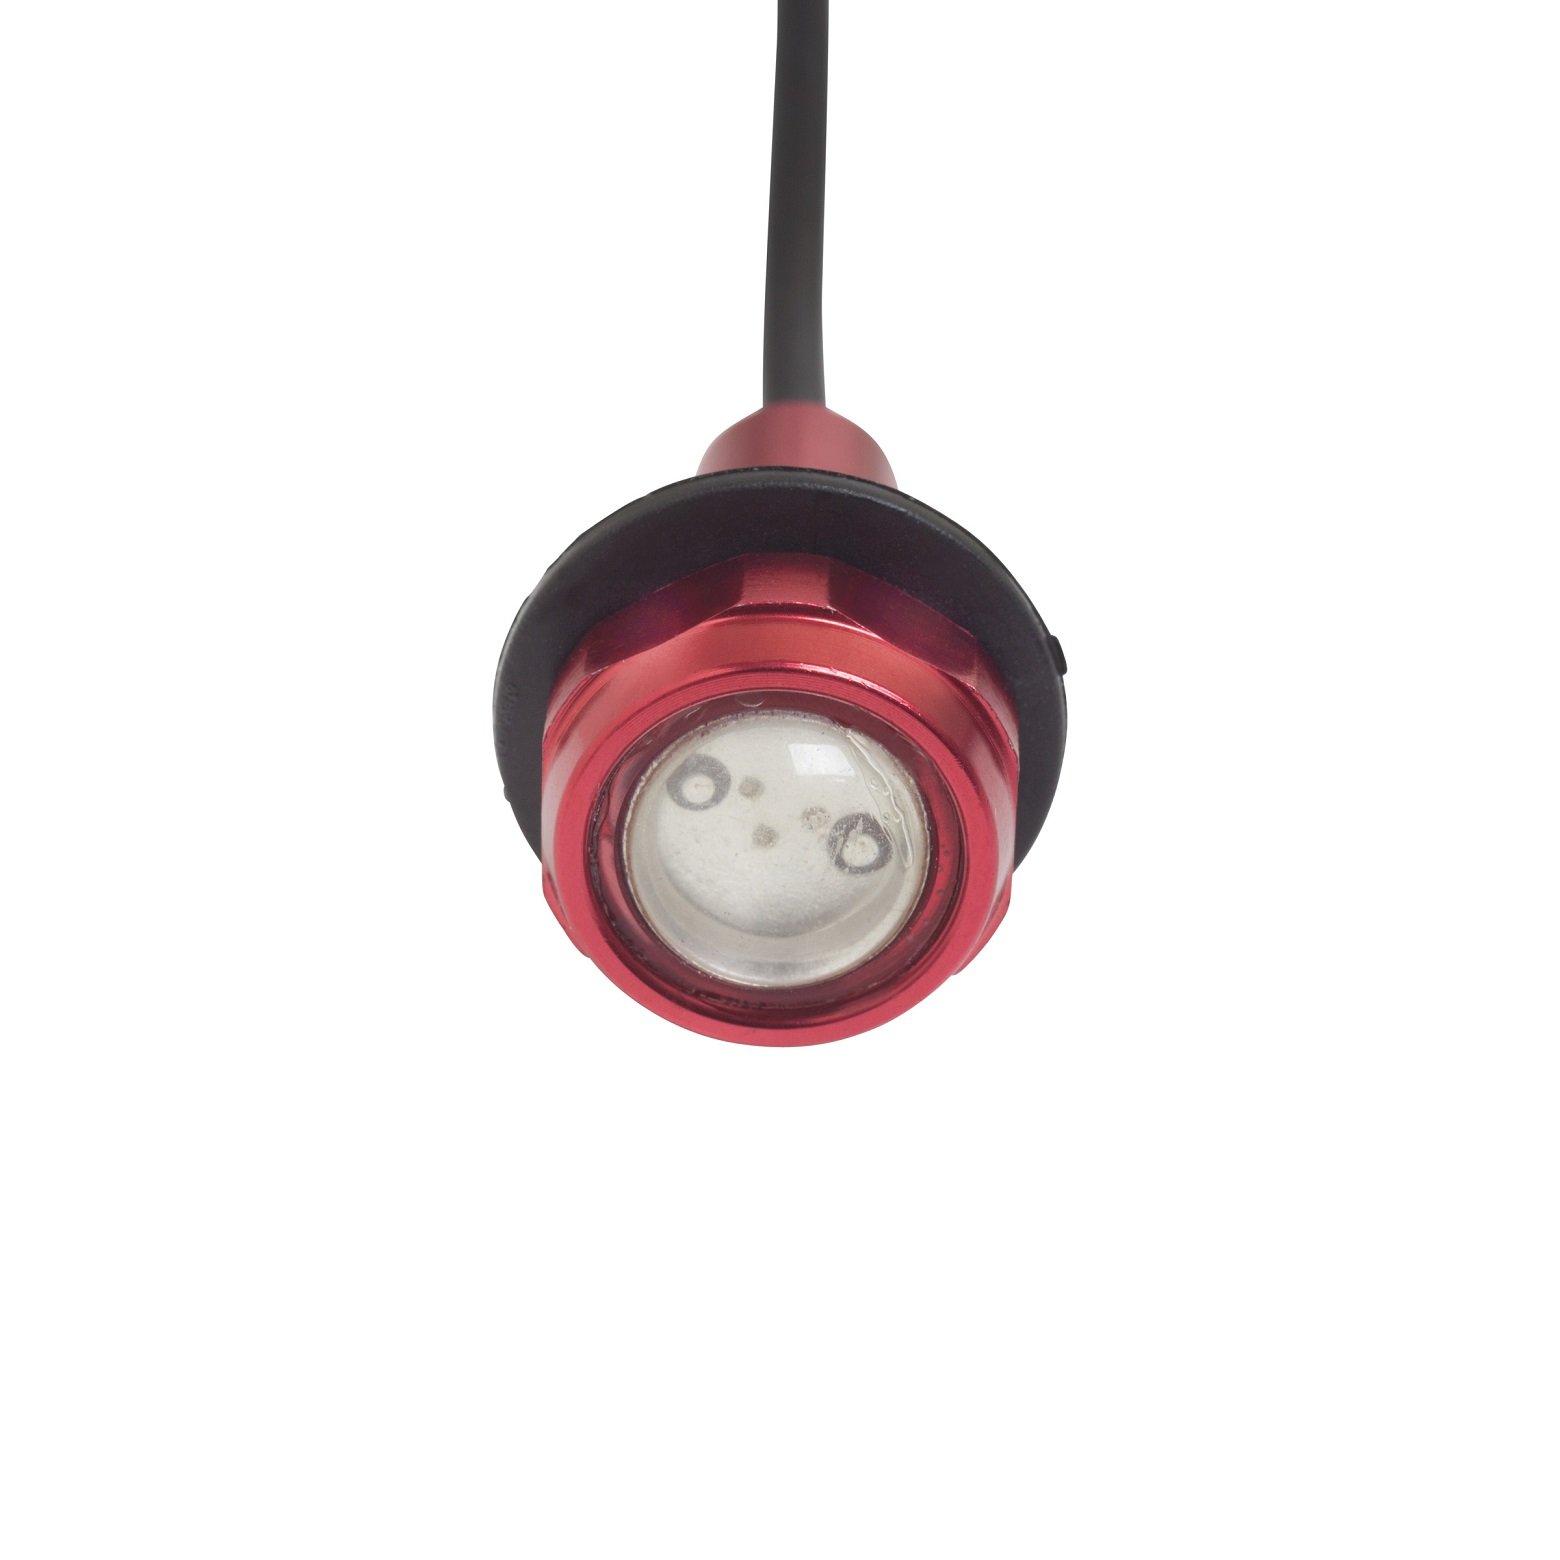 Yak-Power Super Bright LED Button Light Kit Red (2pcs) by Yak-Power (Image #1)